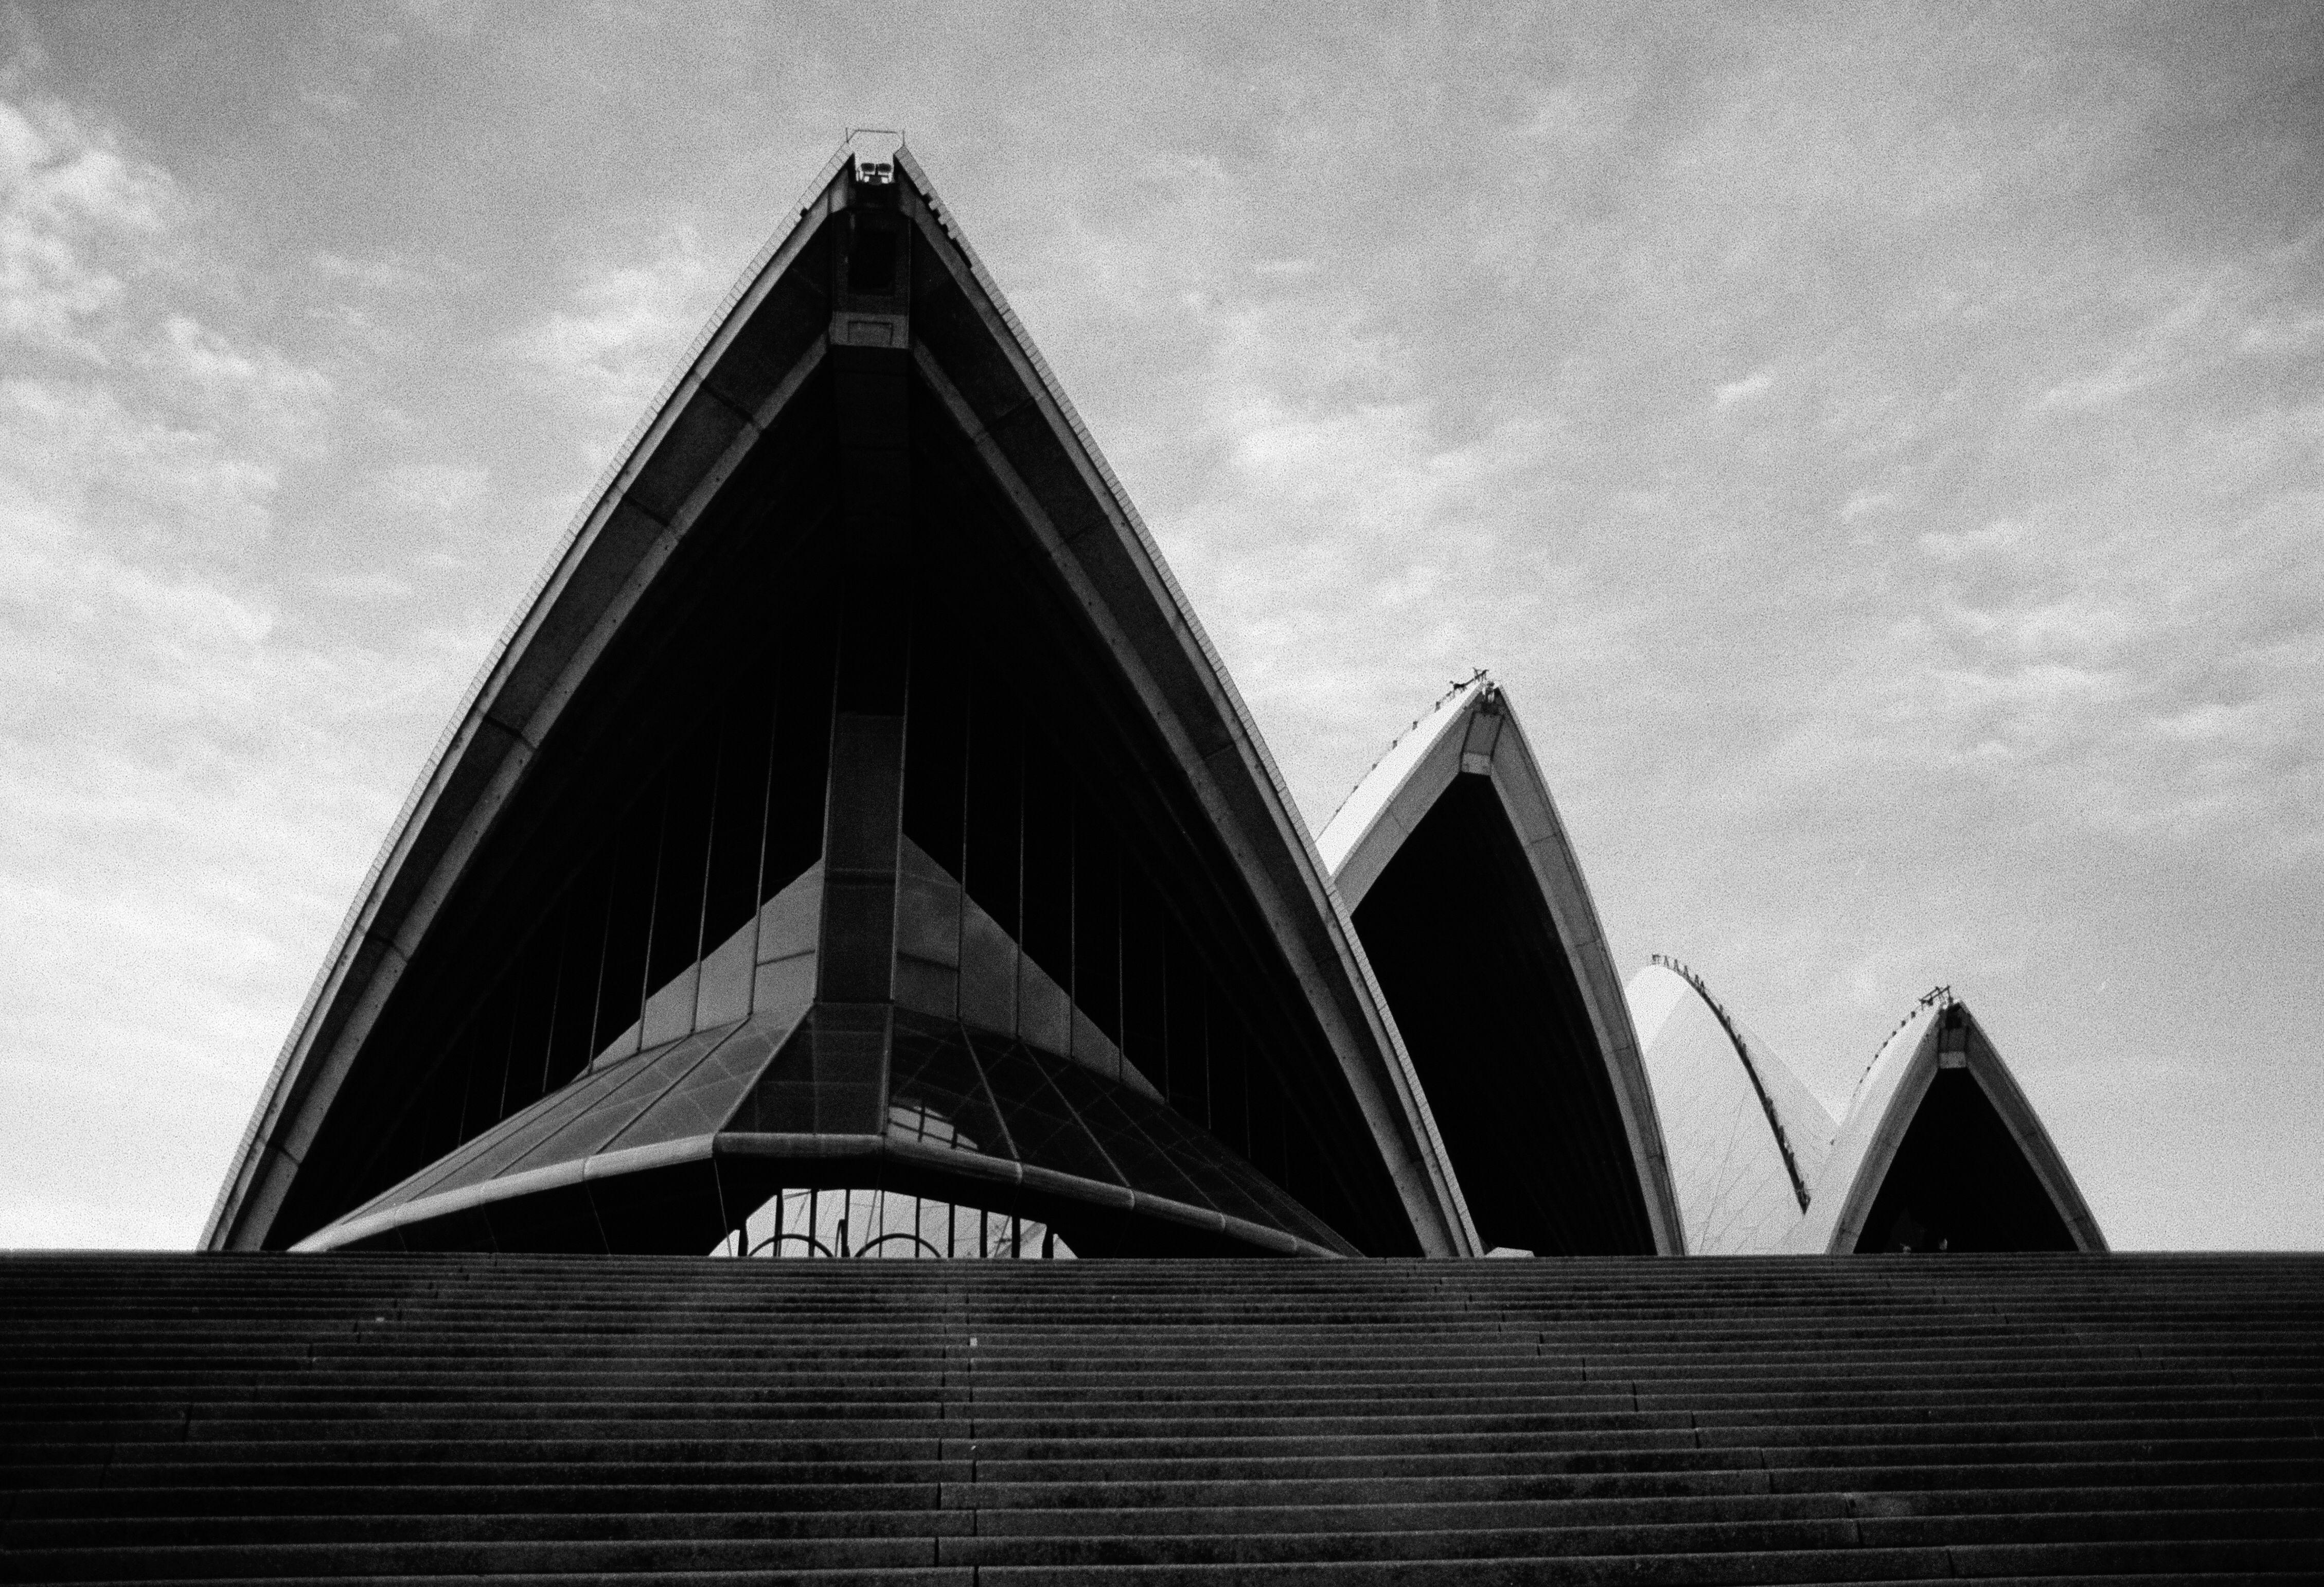 Opera I Love The Sydney Opera House As A Multi Venue Performing Arts Centre Architecture Building Art Center Opera Opera House Sydney Opera House Opera